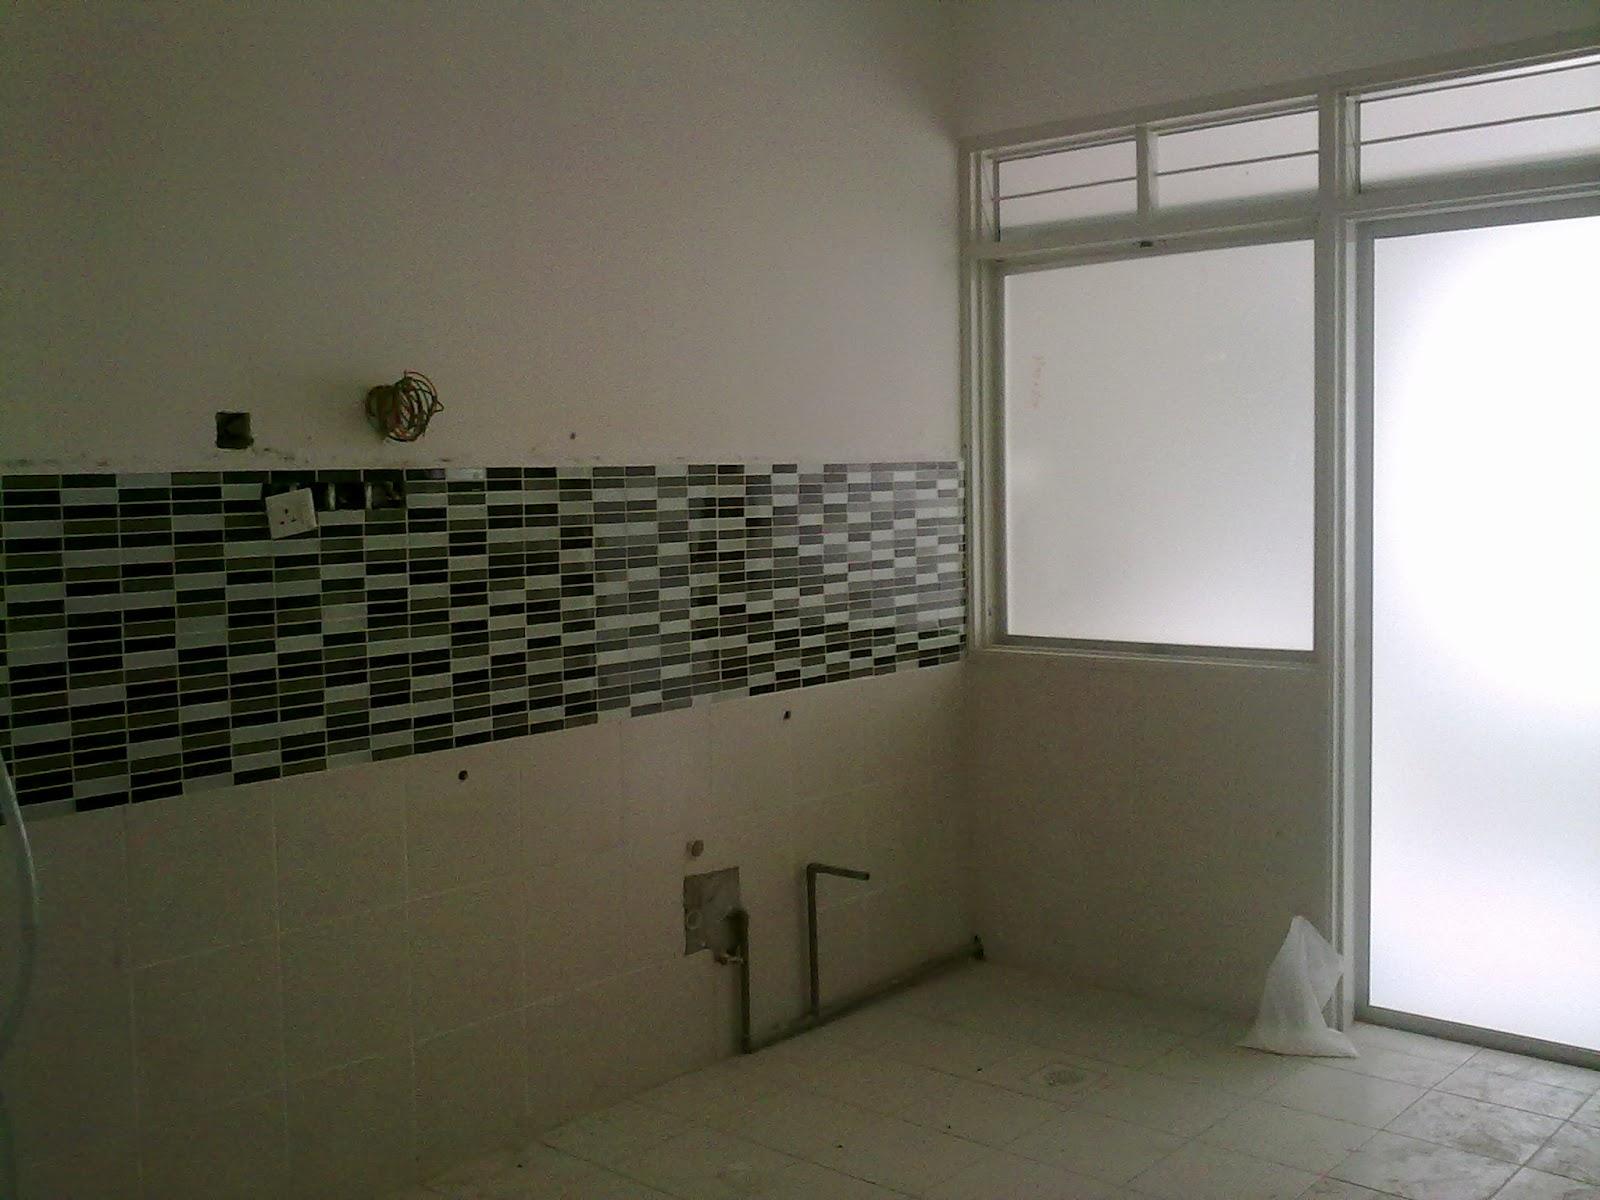 antara dry kitchen dgn wet kitchen dipisahkan oleh dinding tingkap